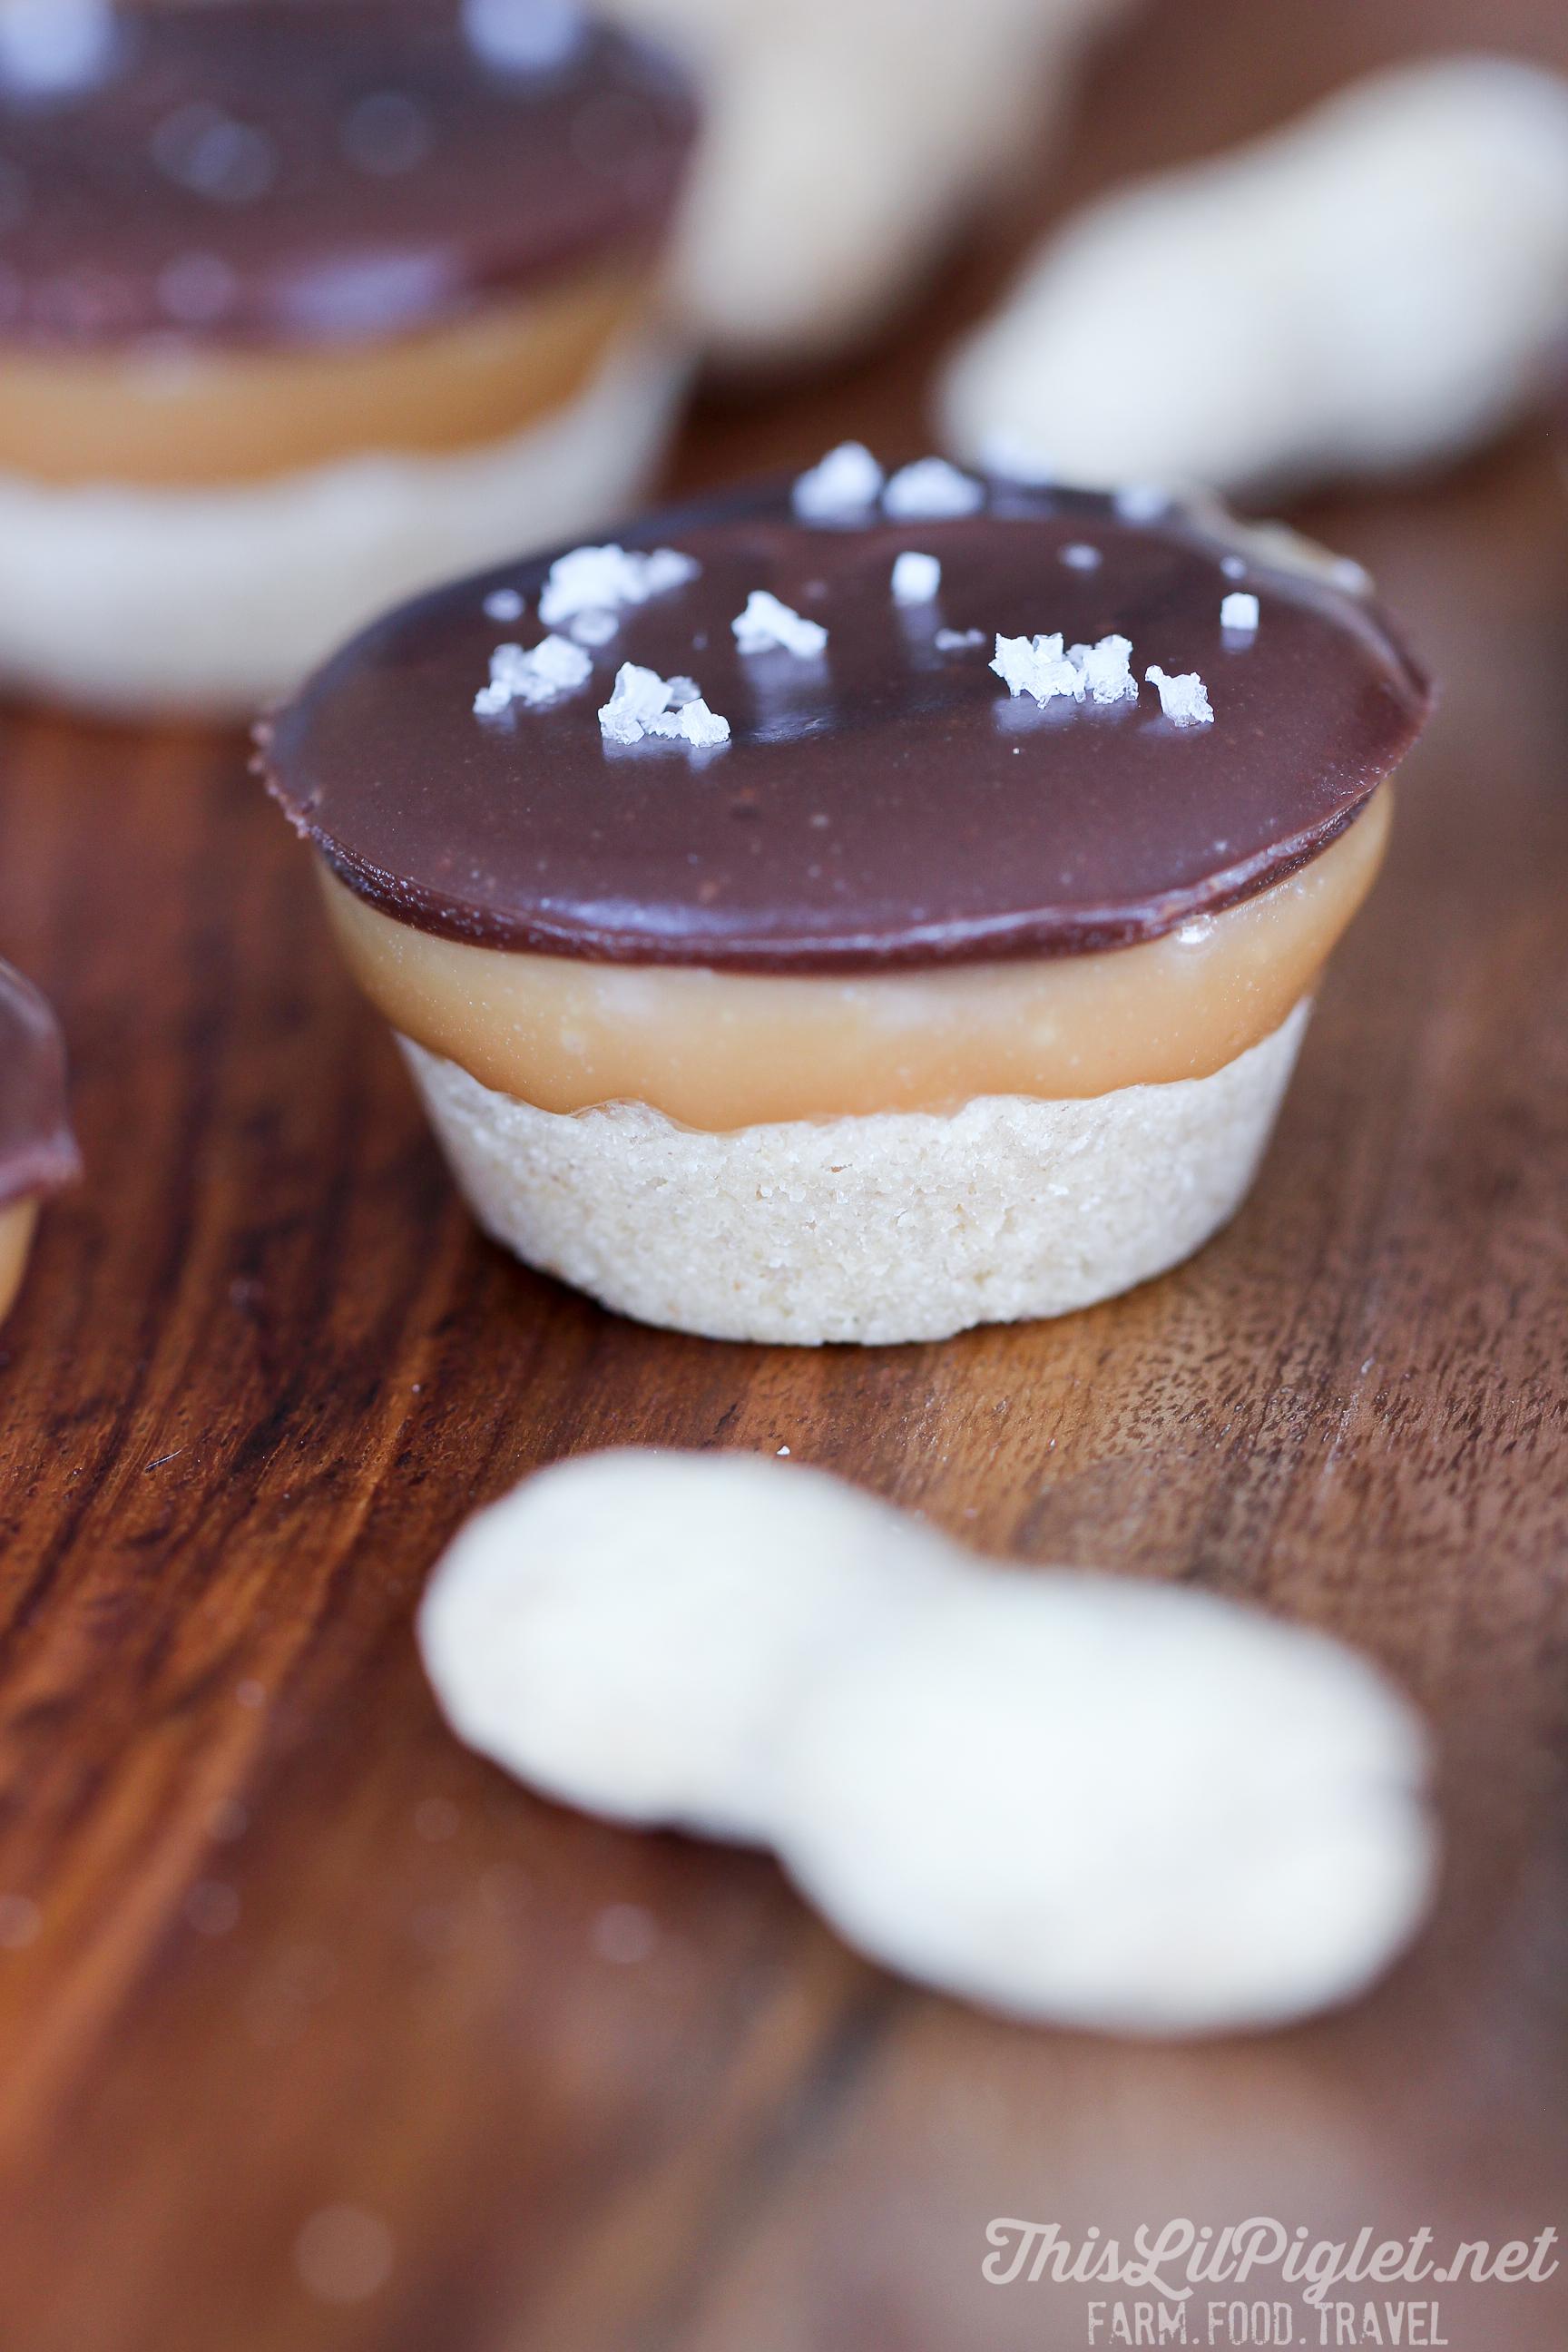 Peanut Butter Shortbread Toffee Bites // thislilpiglet.net